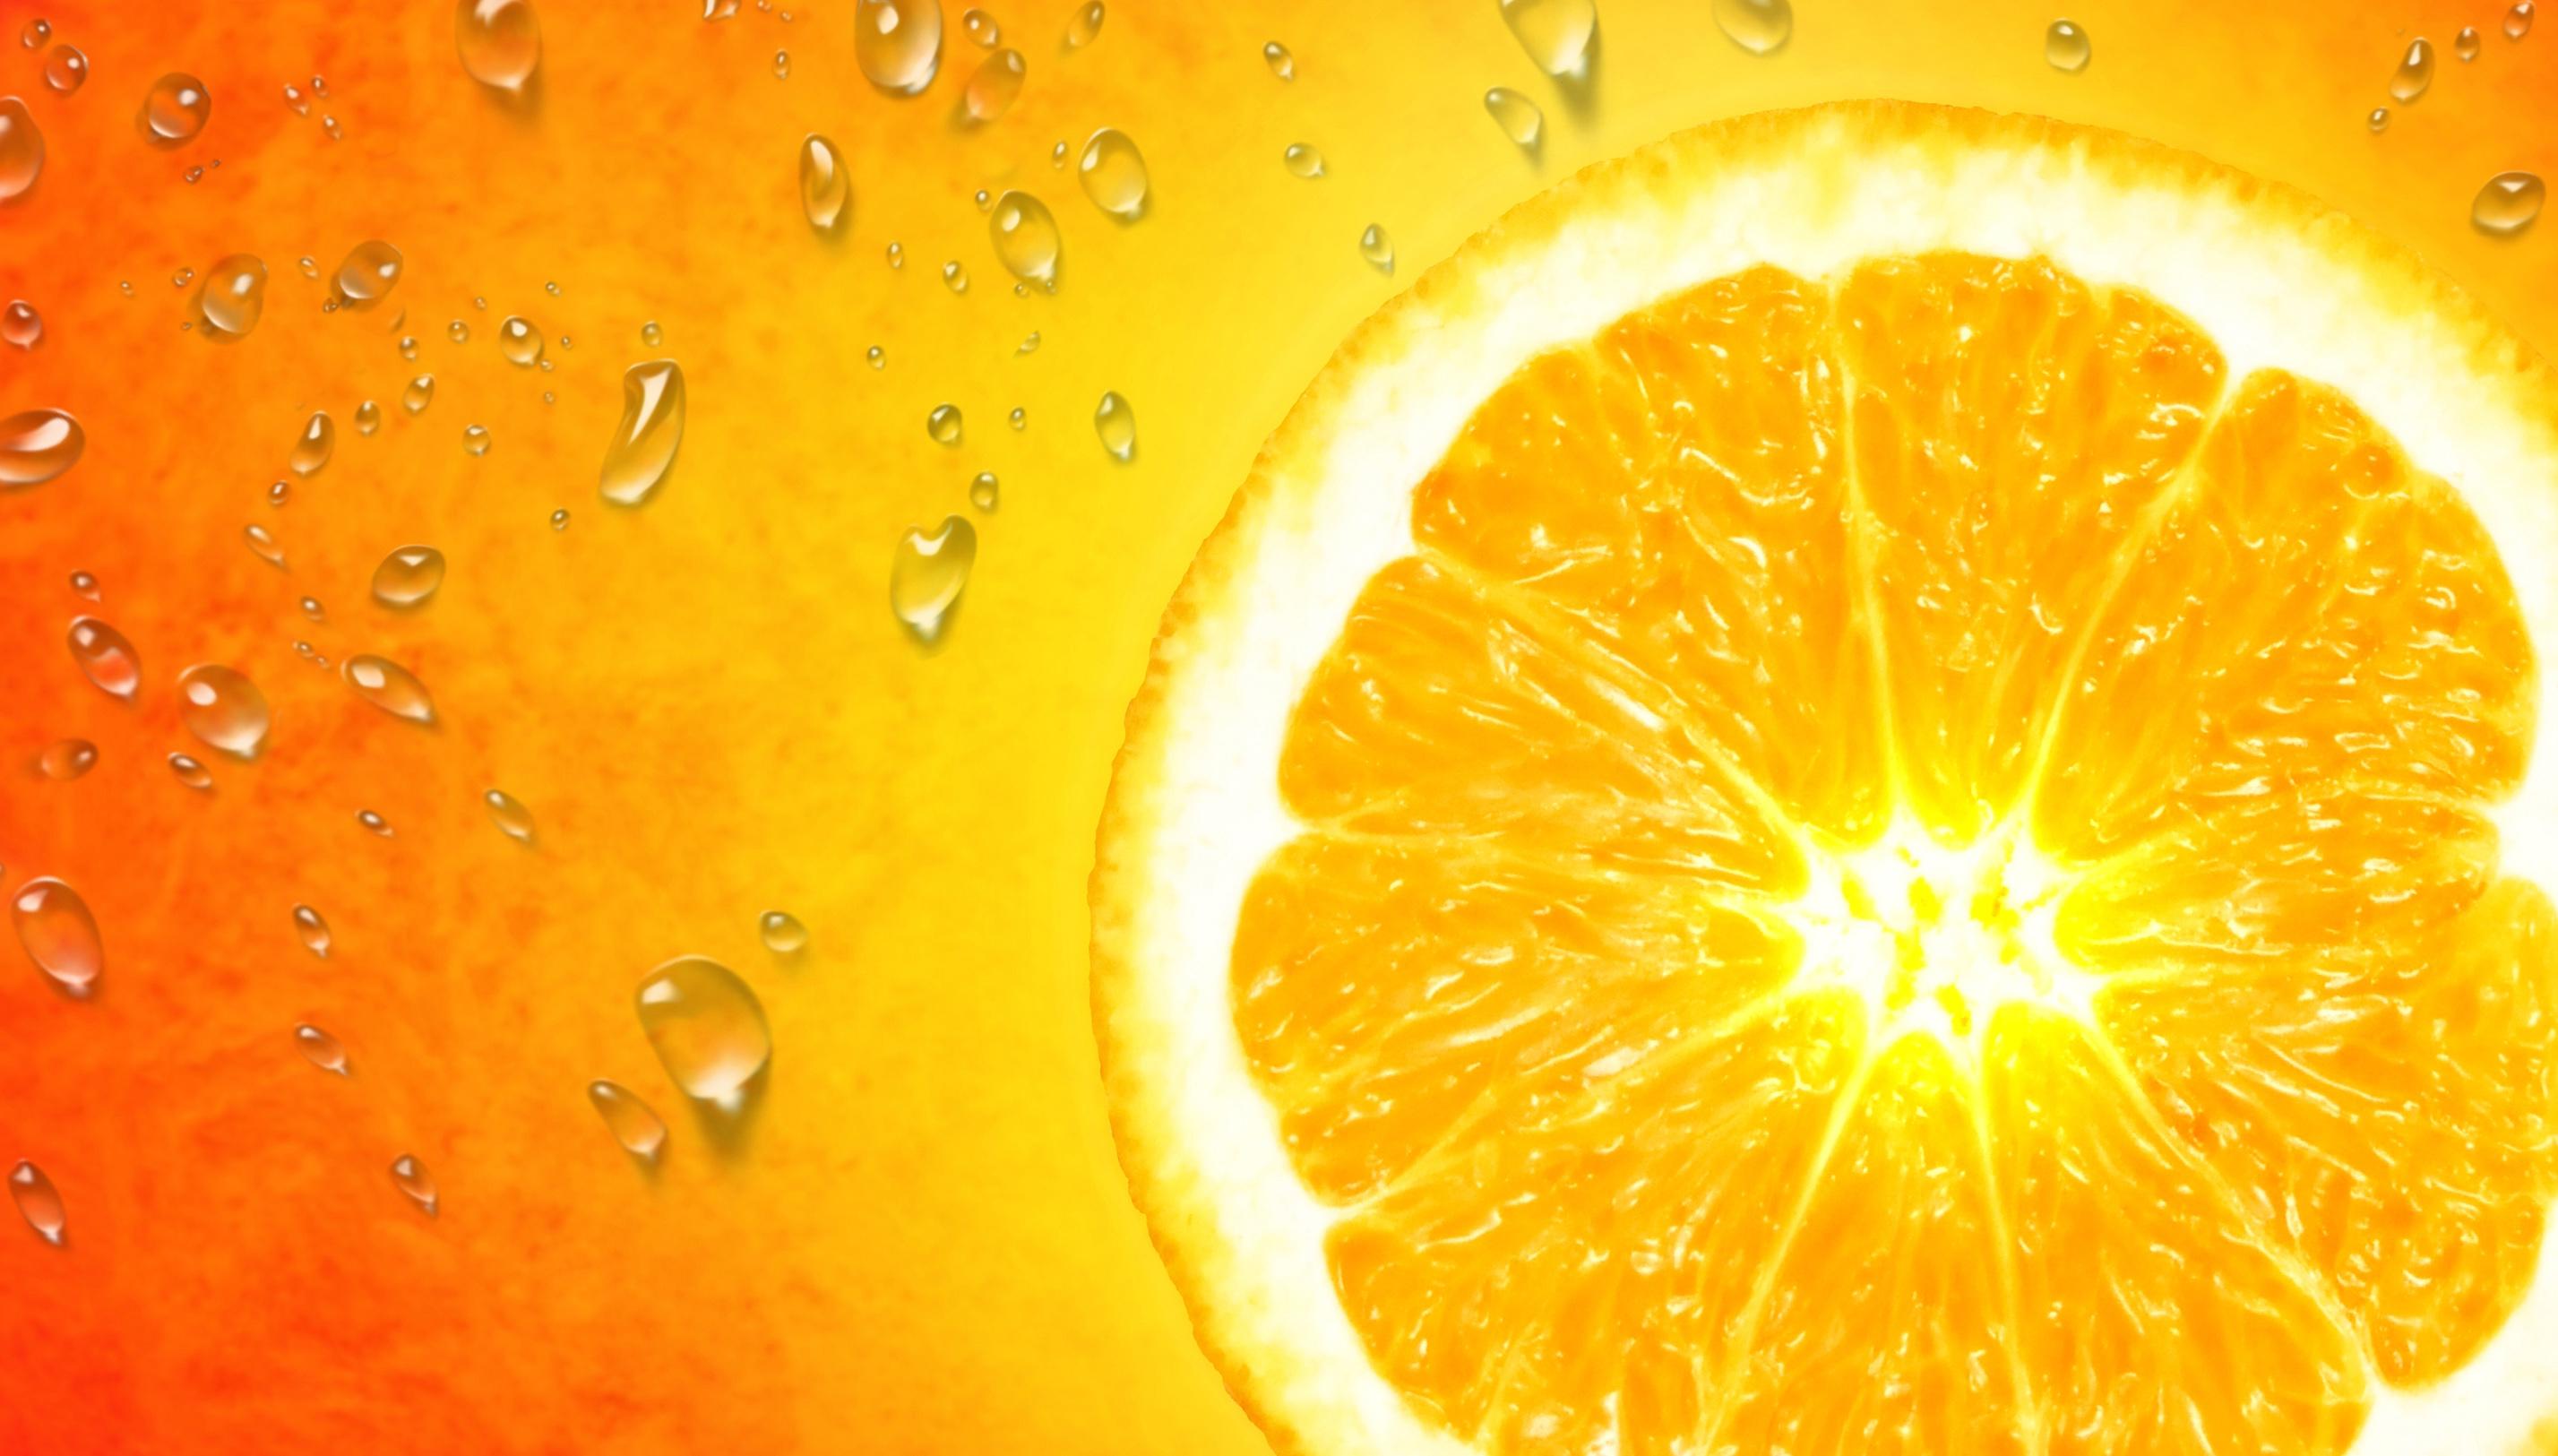 Orange Slice on Orange Background, Agriculture, One, Orange, Orangecloseup, HQ Photo